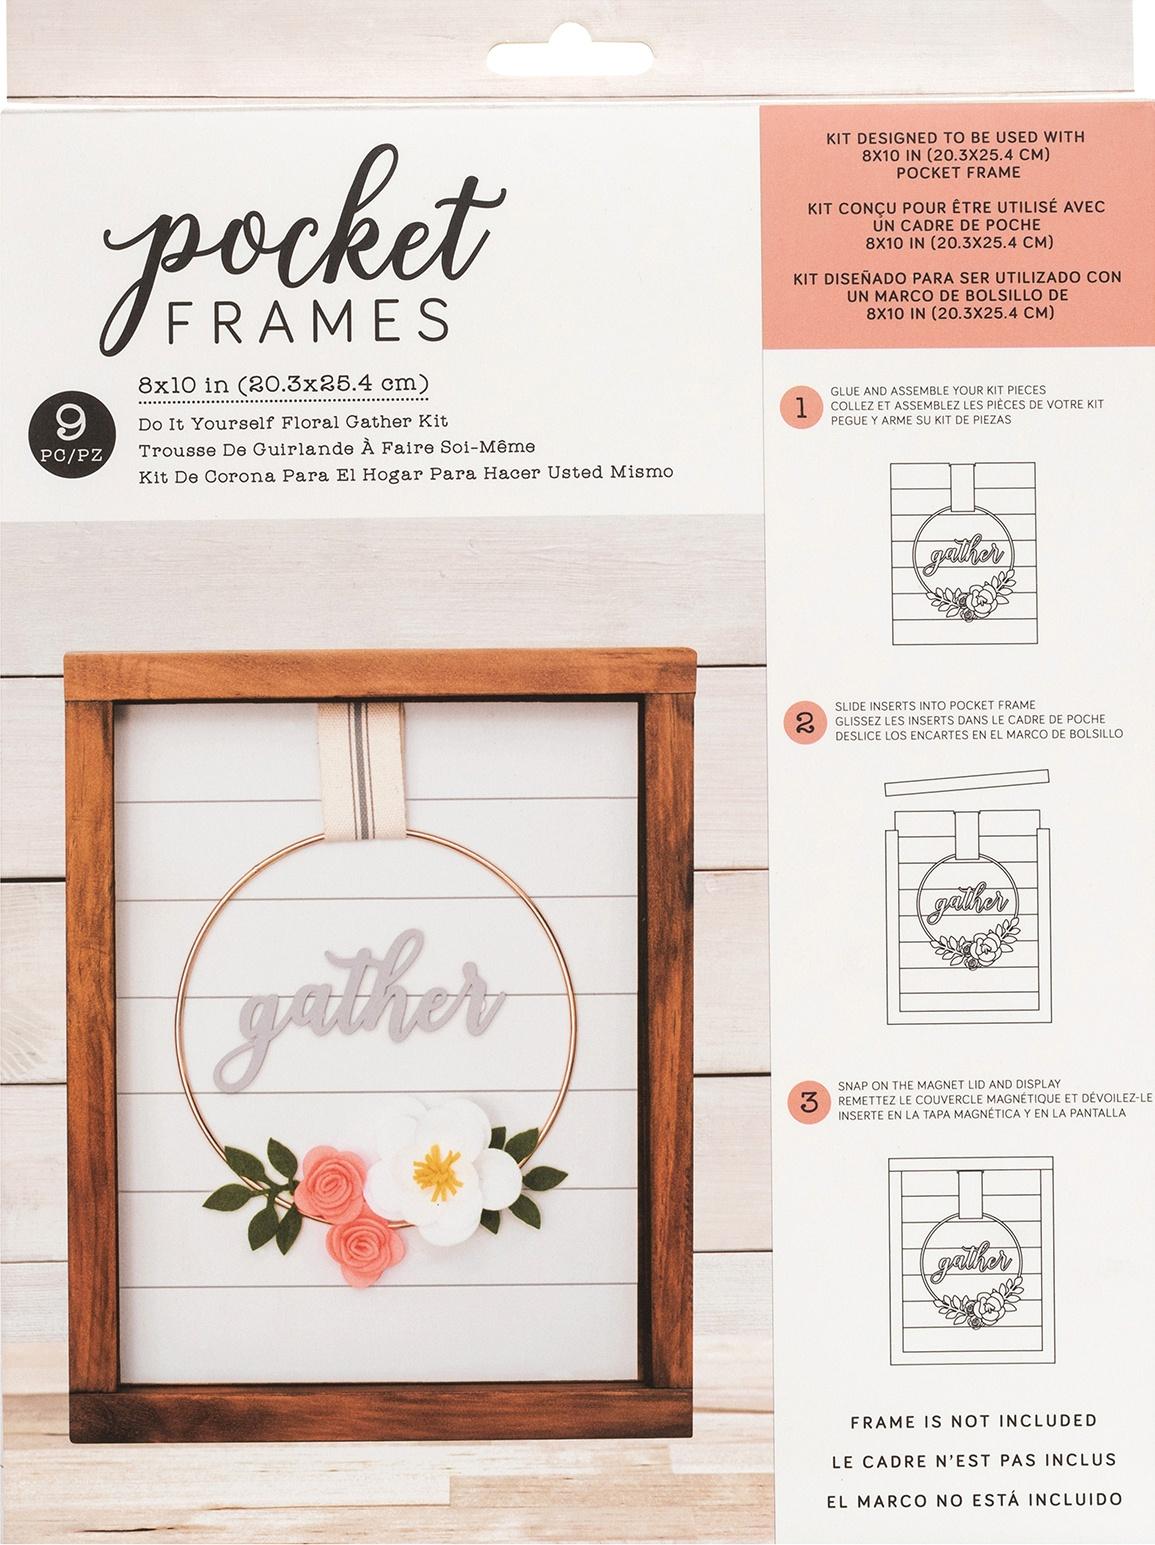 American Crafts Pocket Frames Insert Kit 8X10 9/Pkg-Gather Wreath W/Insert